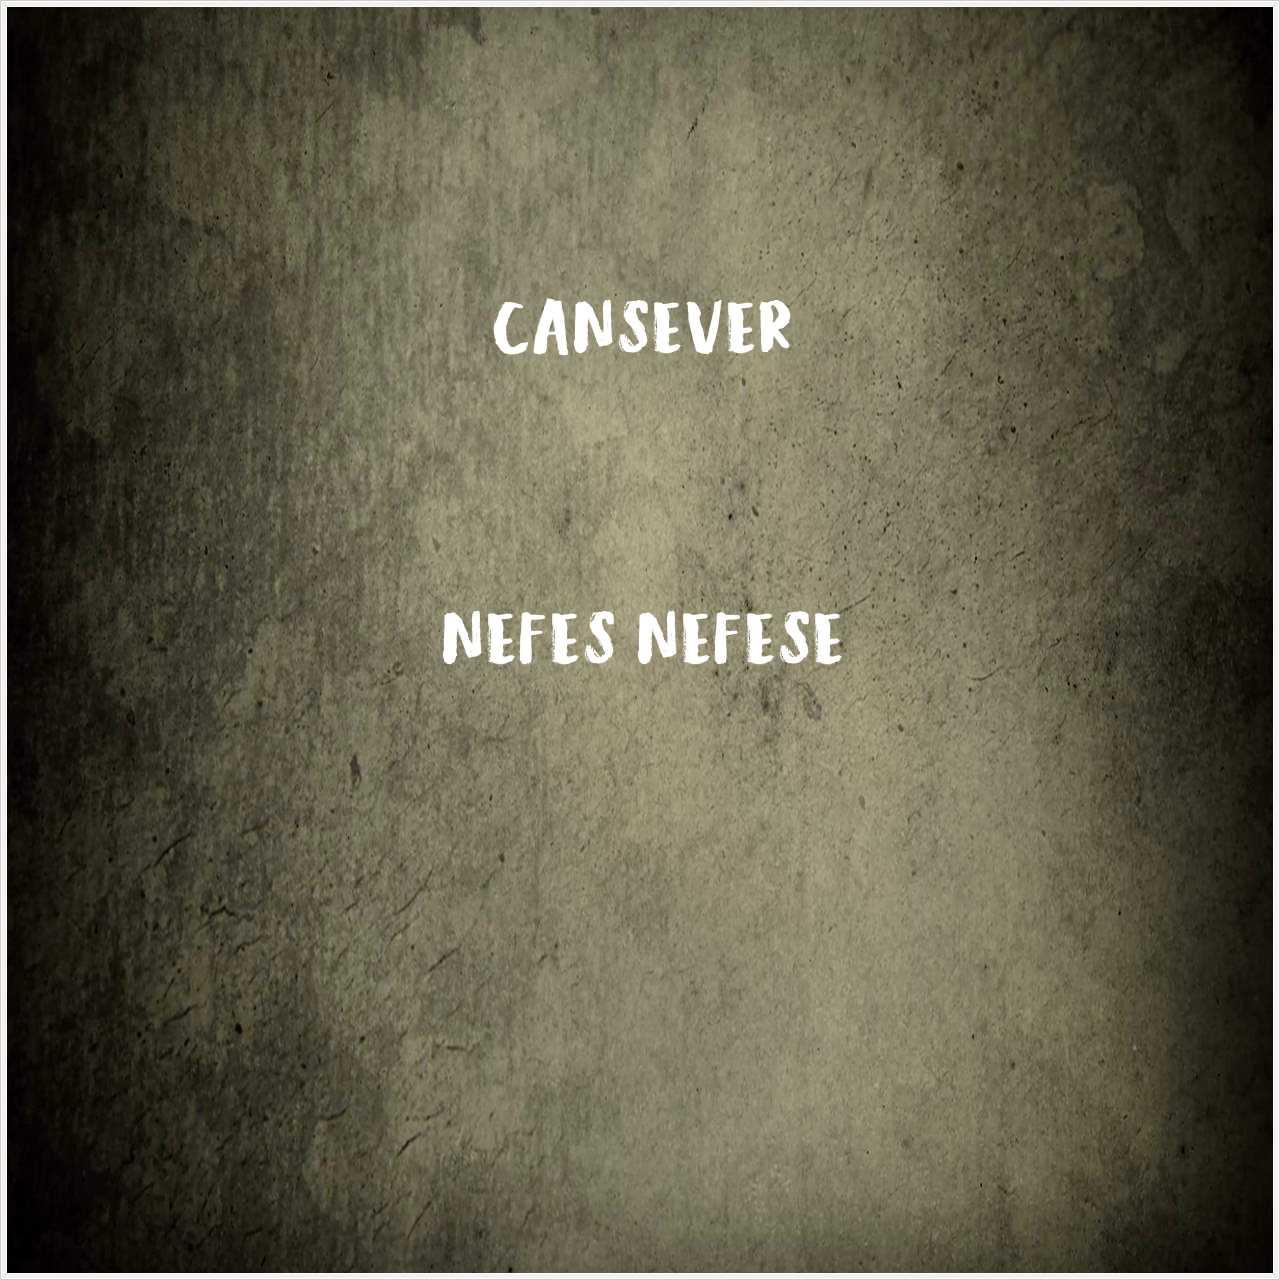 دانلود آهنگ جدید Cansever به نام Nefes Nefese